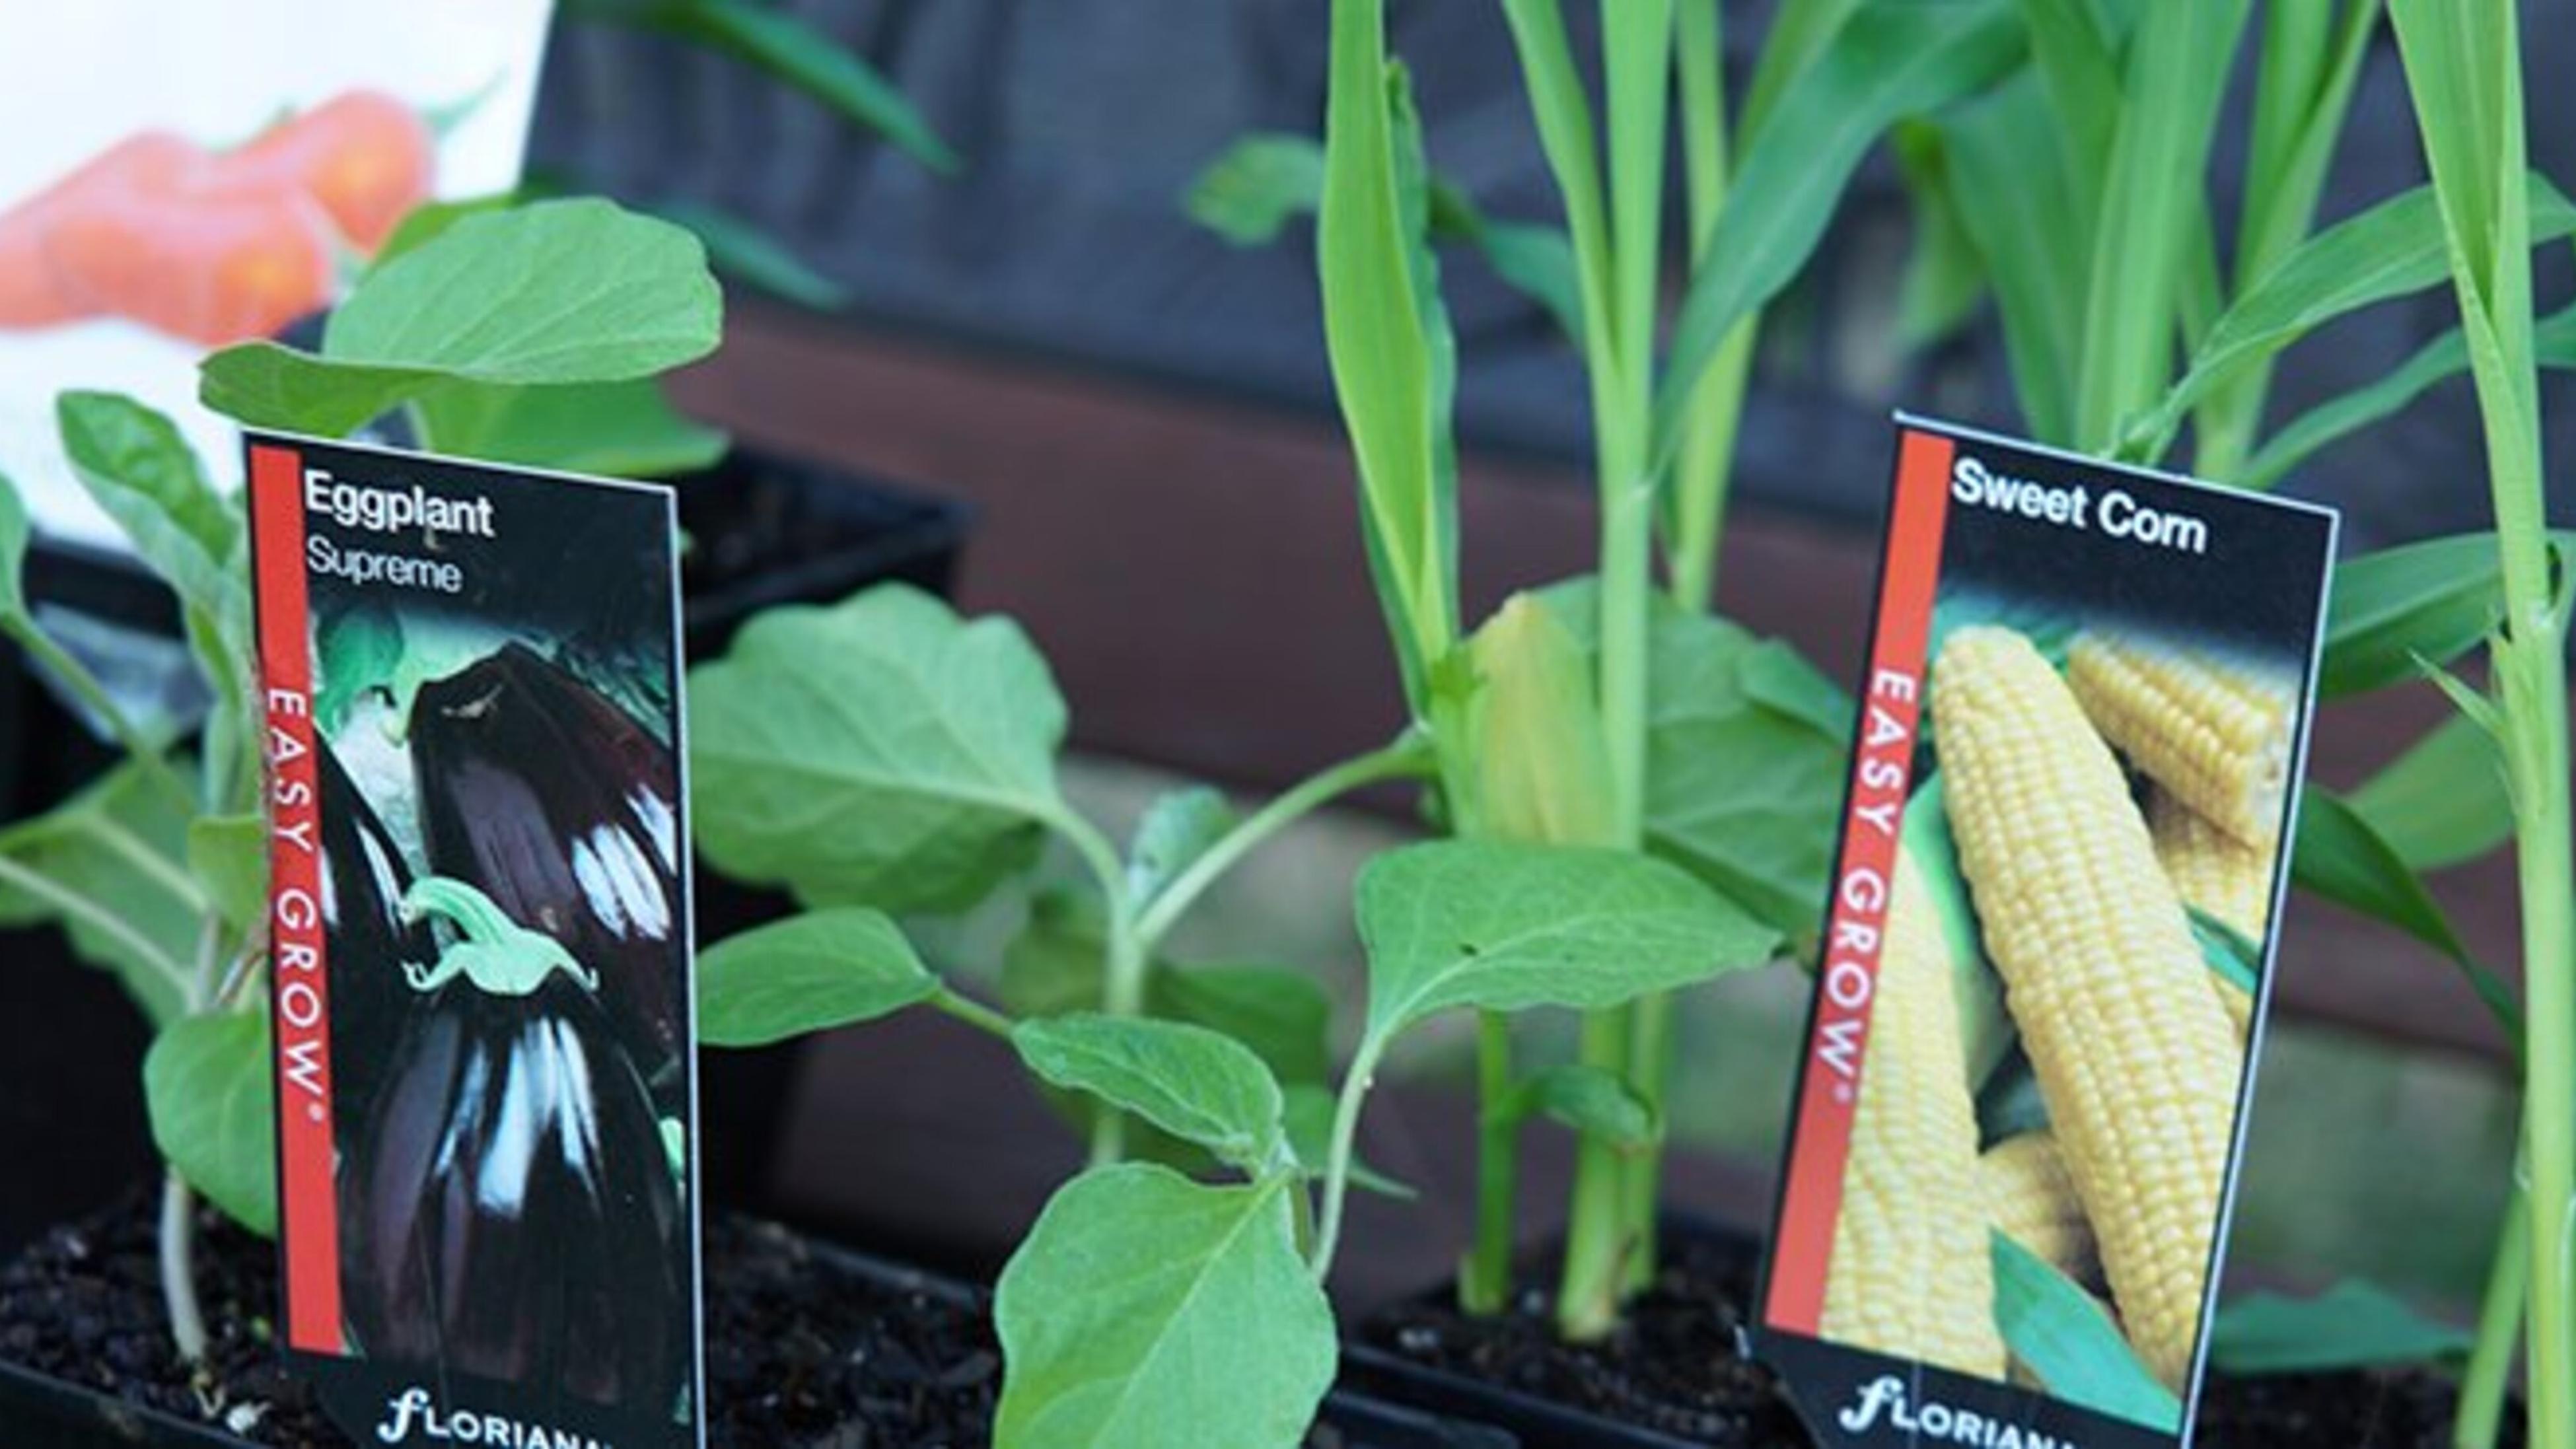 Young eggplant and sweet corn plants